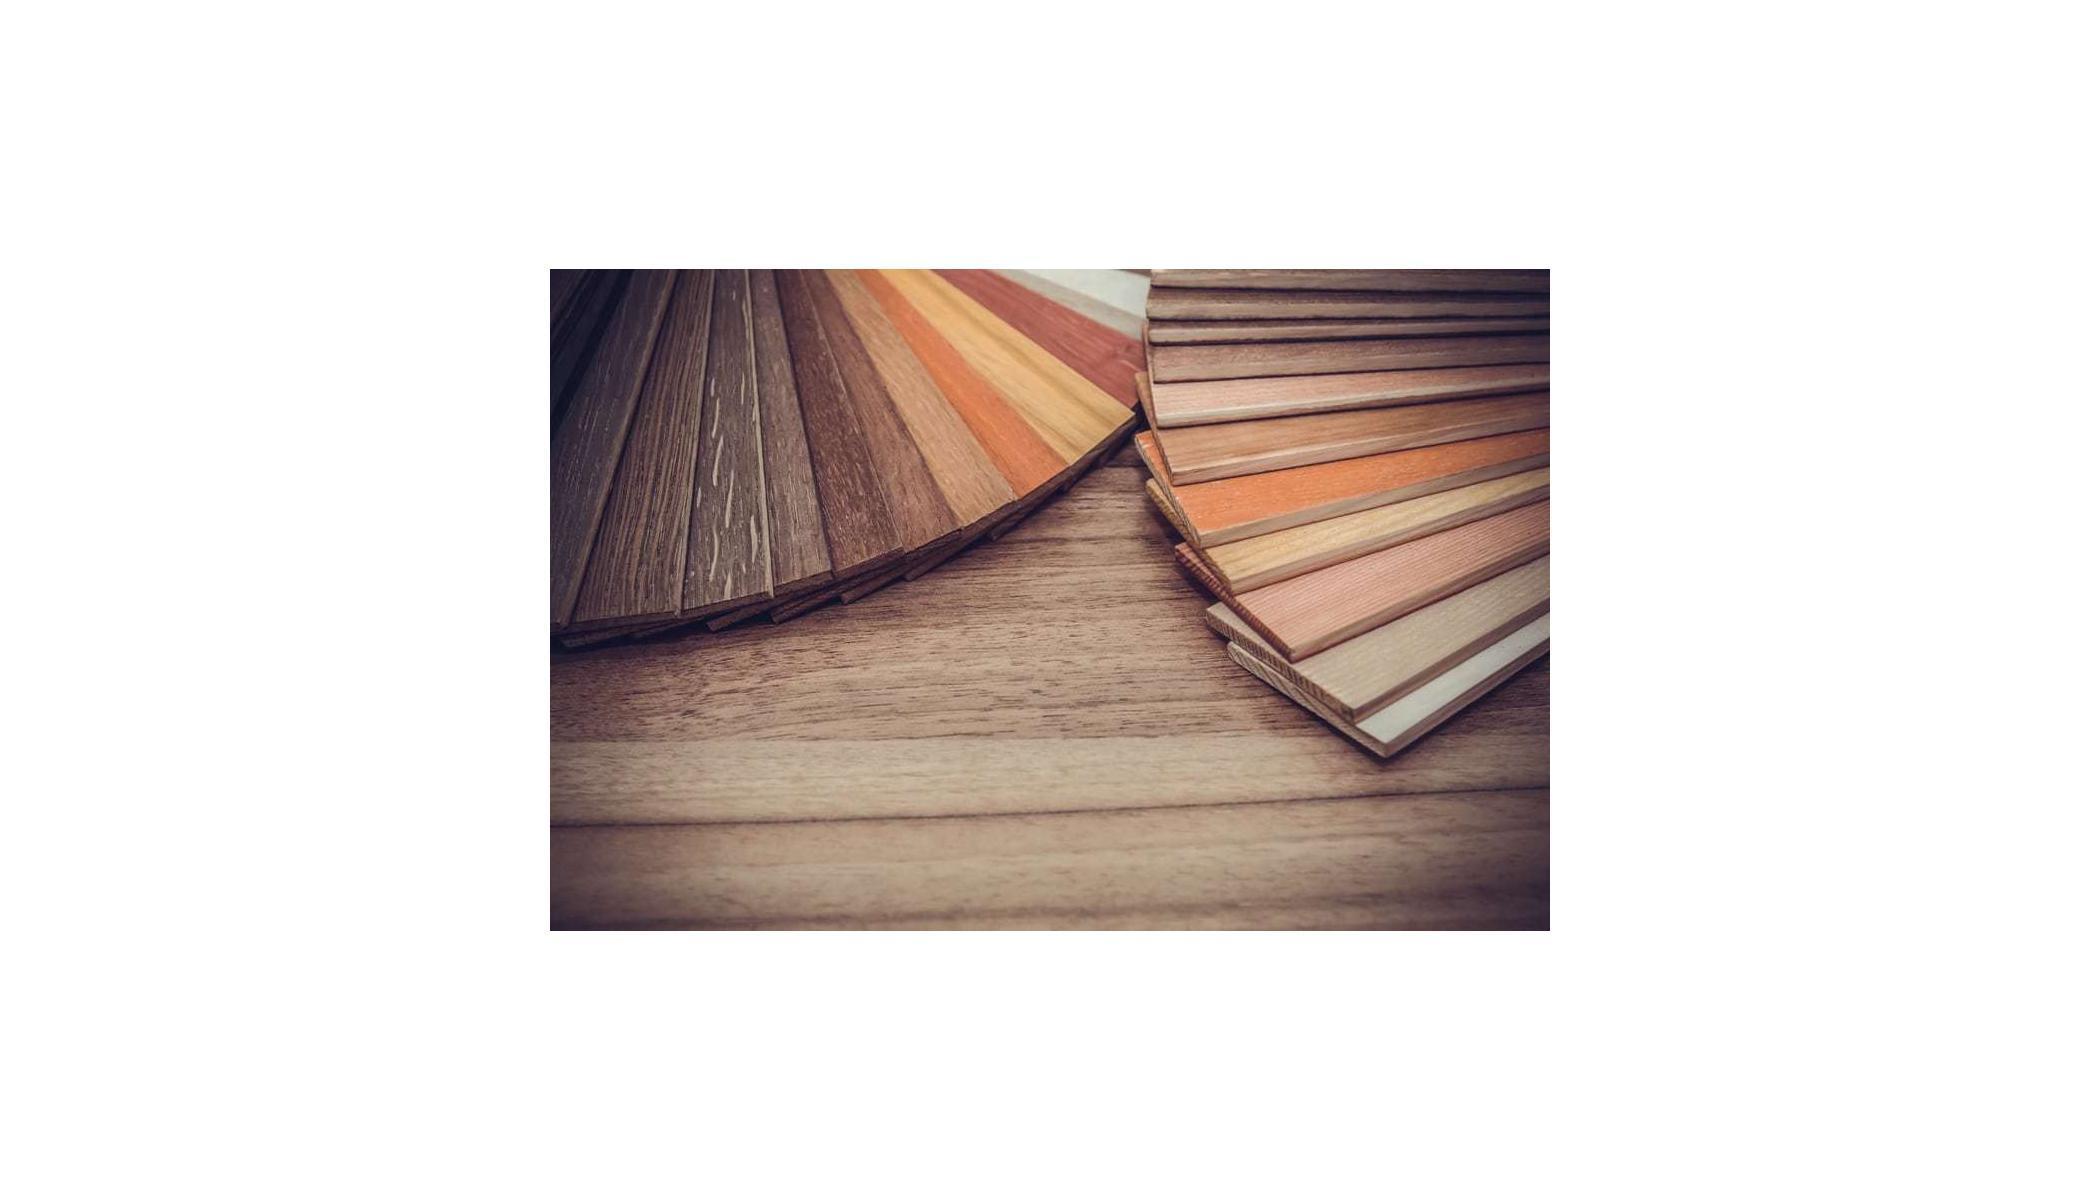 A variety of hardwood floors.